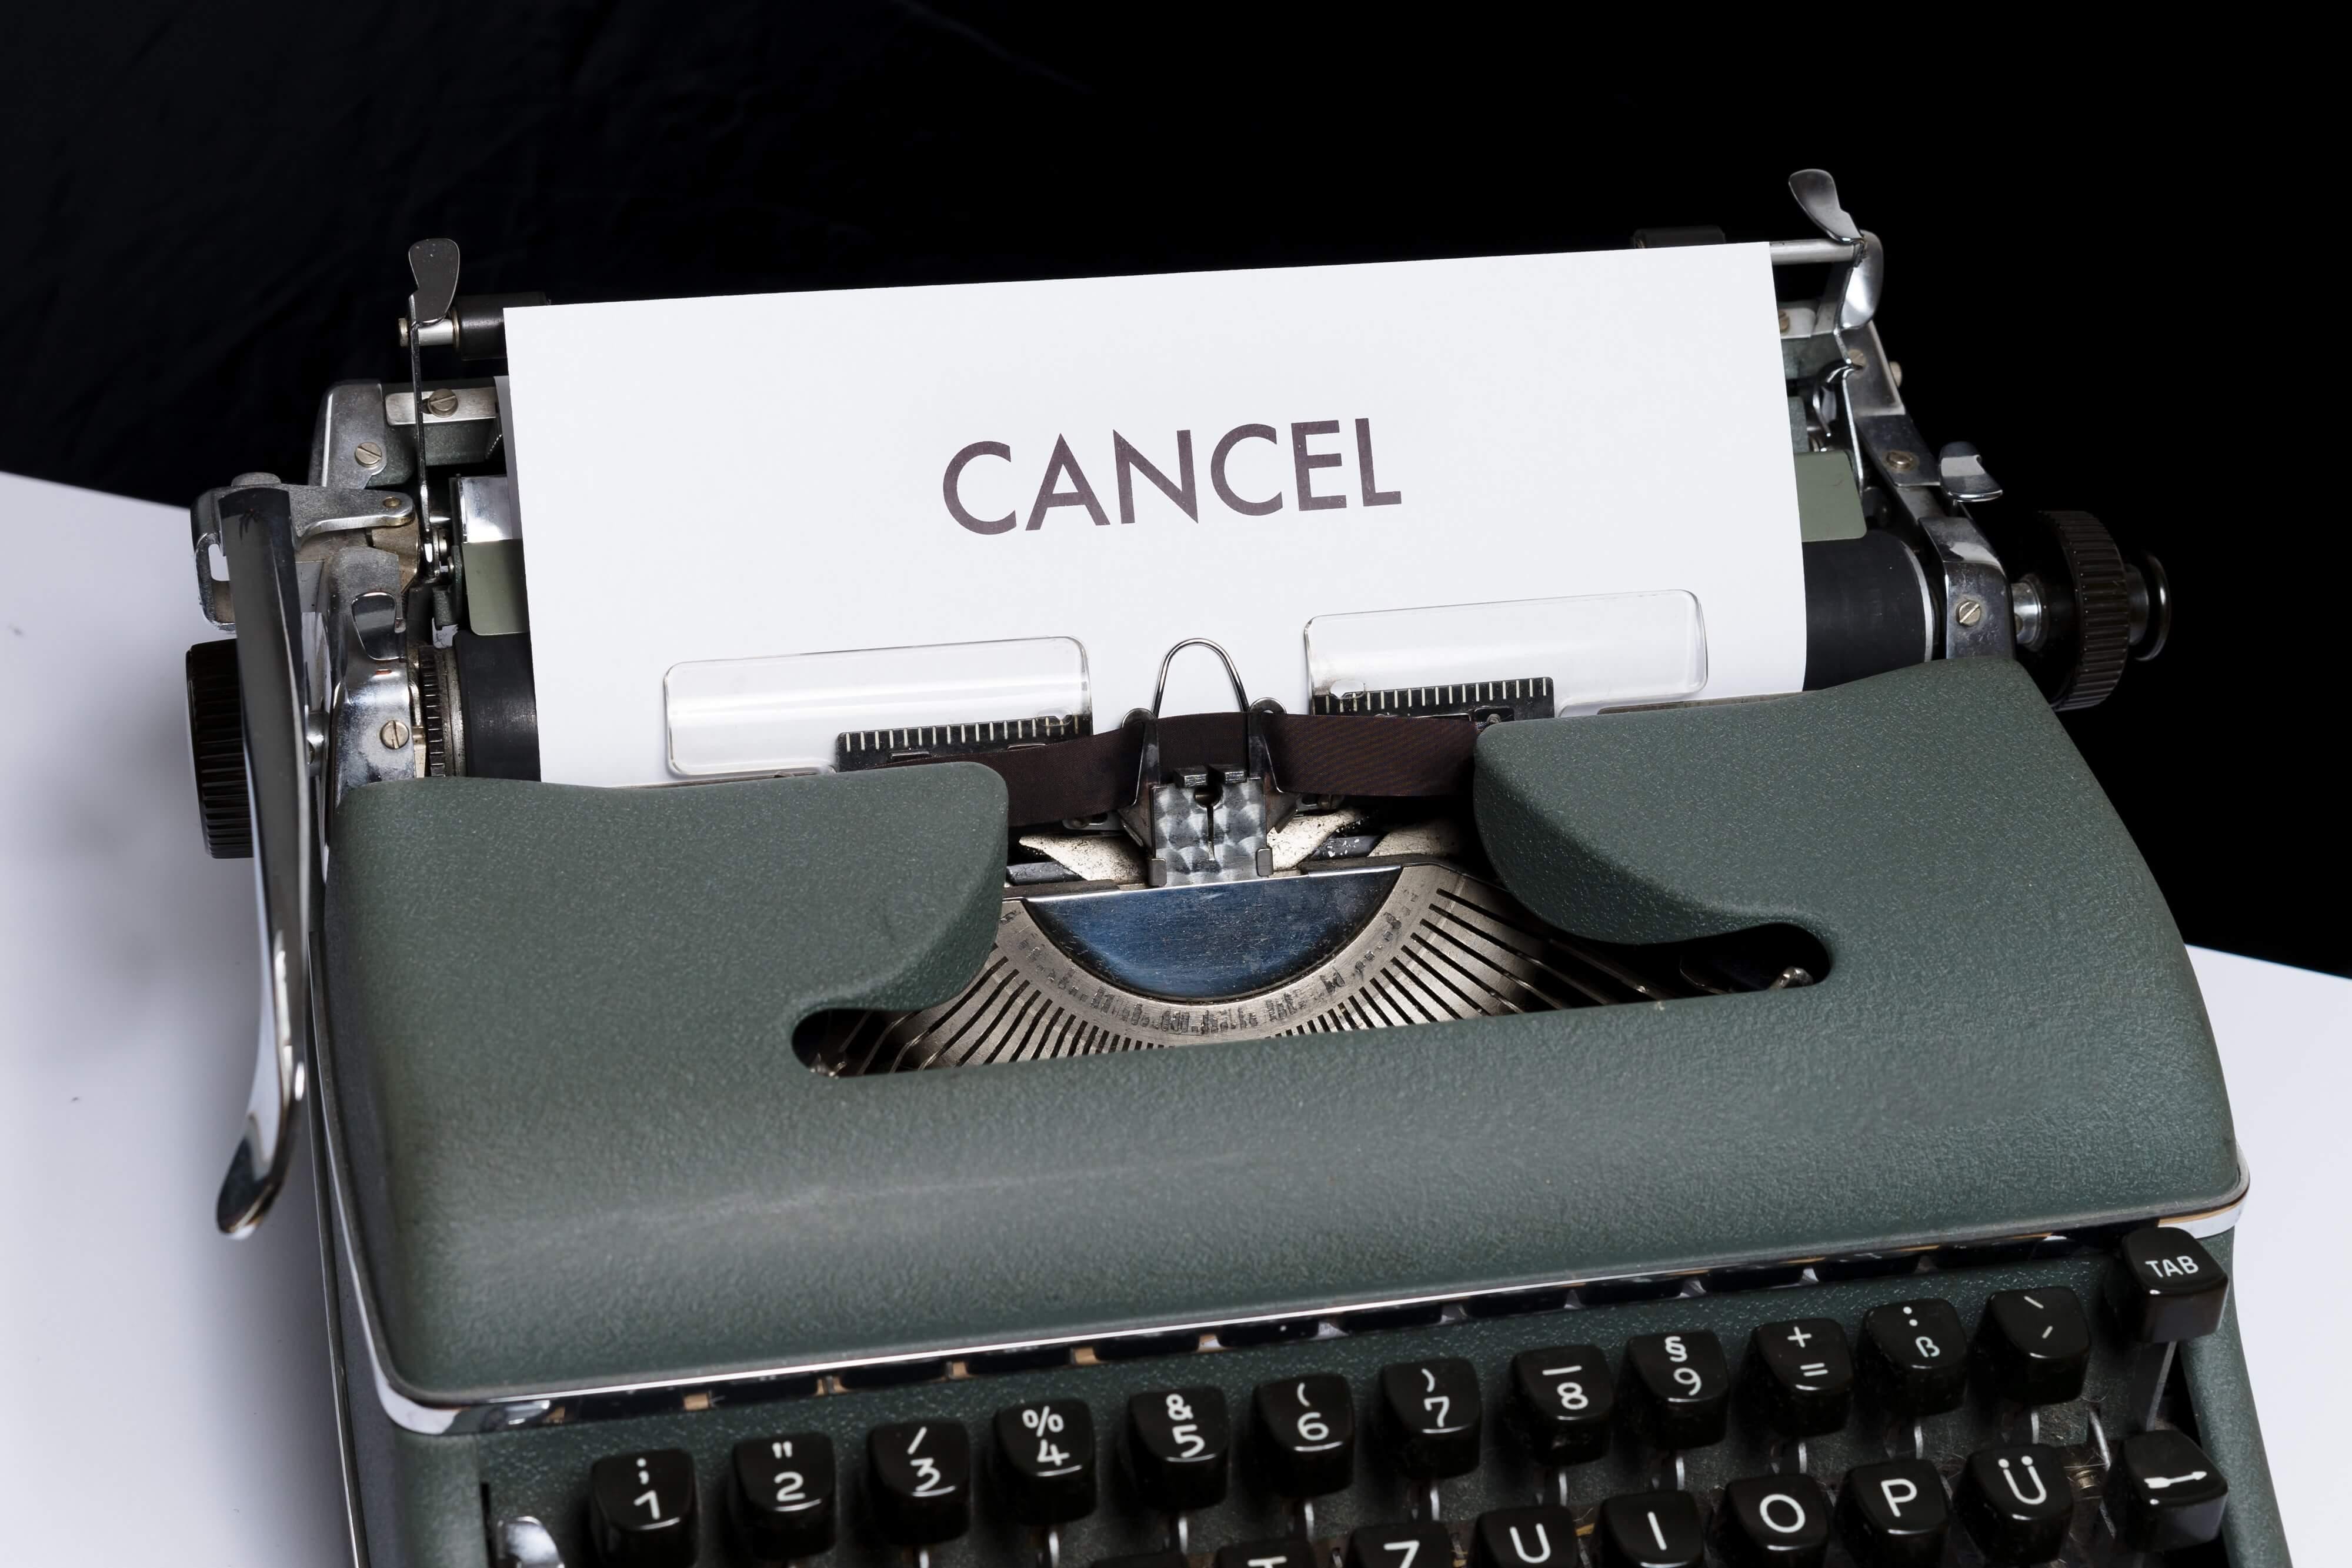 Direct Debit cancelation